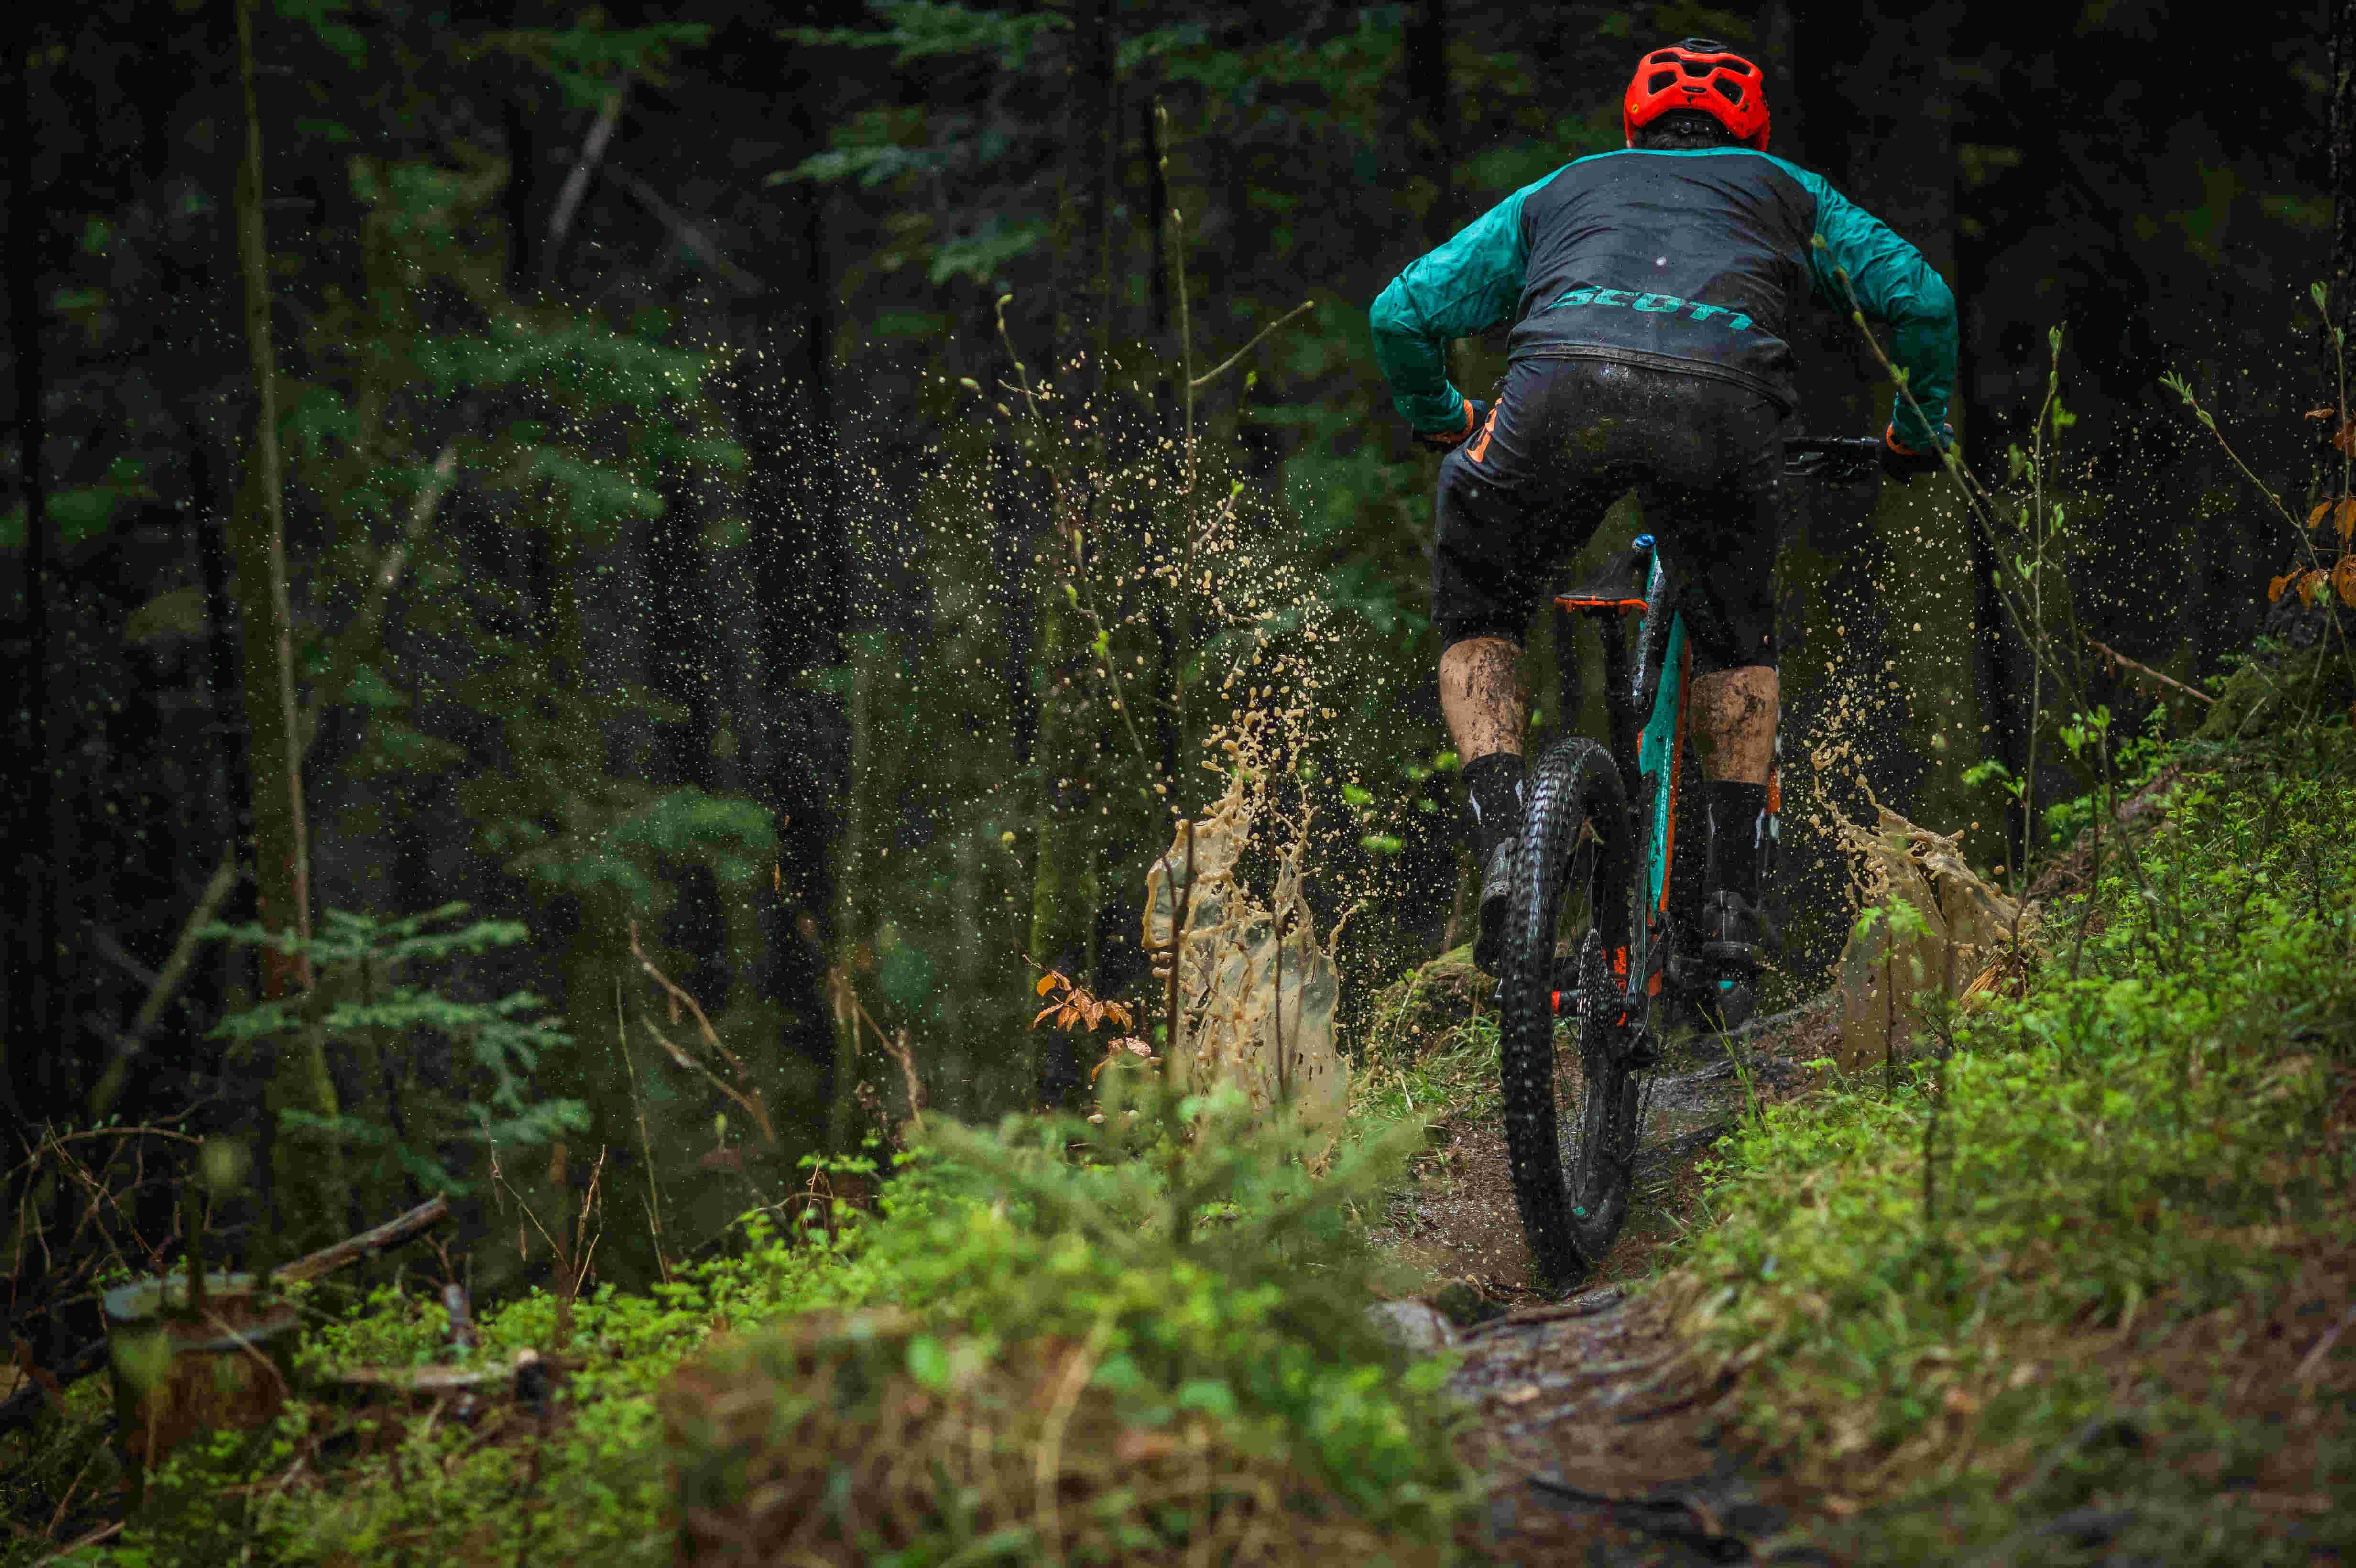 Chasing Trail